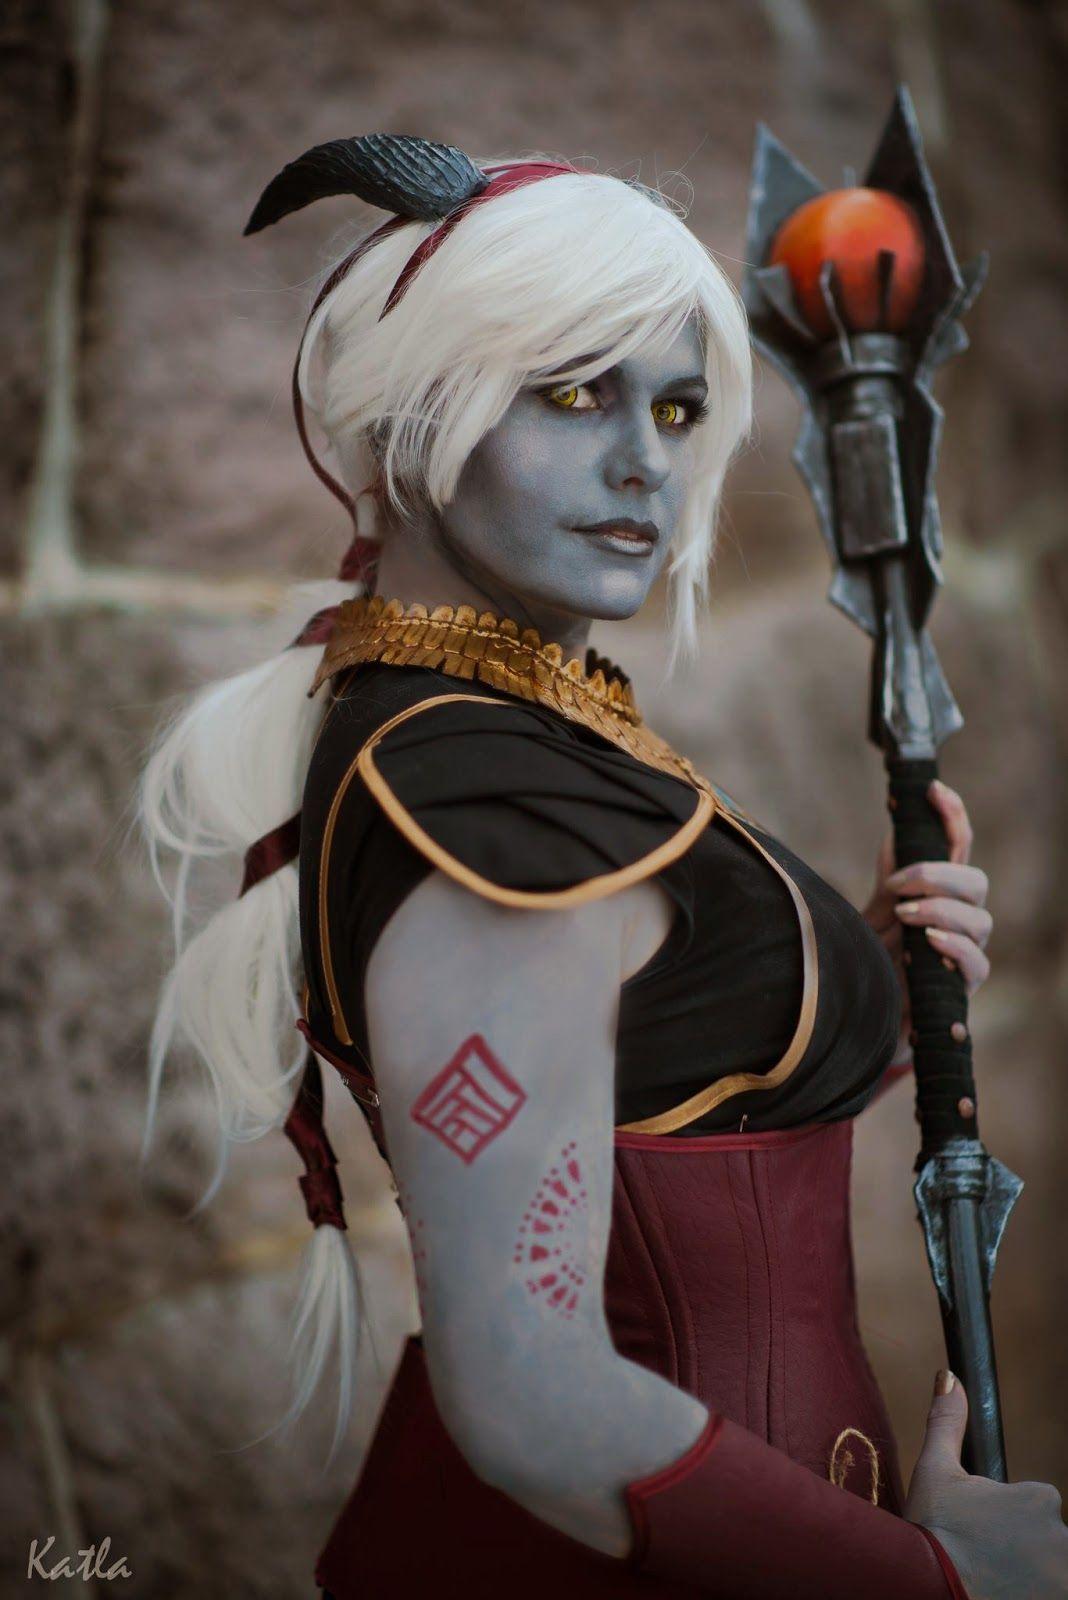 http://chrixdesign.blogspot.no/2015/04/qunari-cosplay-from-dragon-age.html